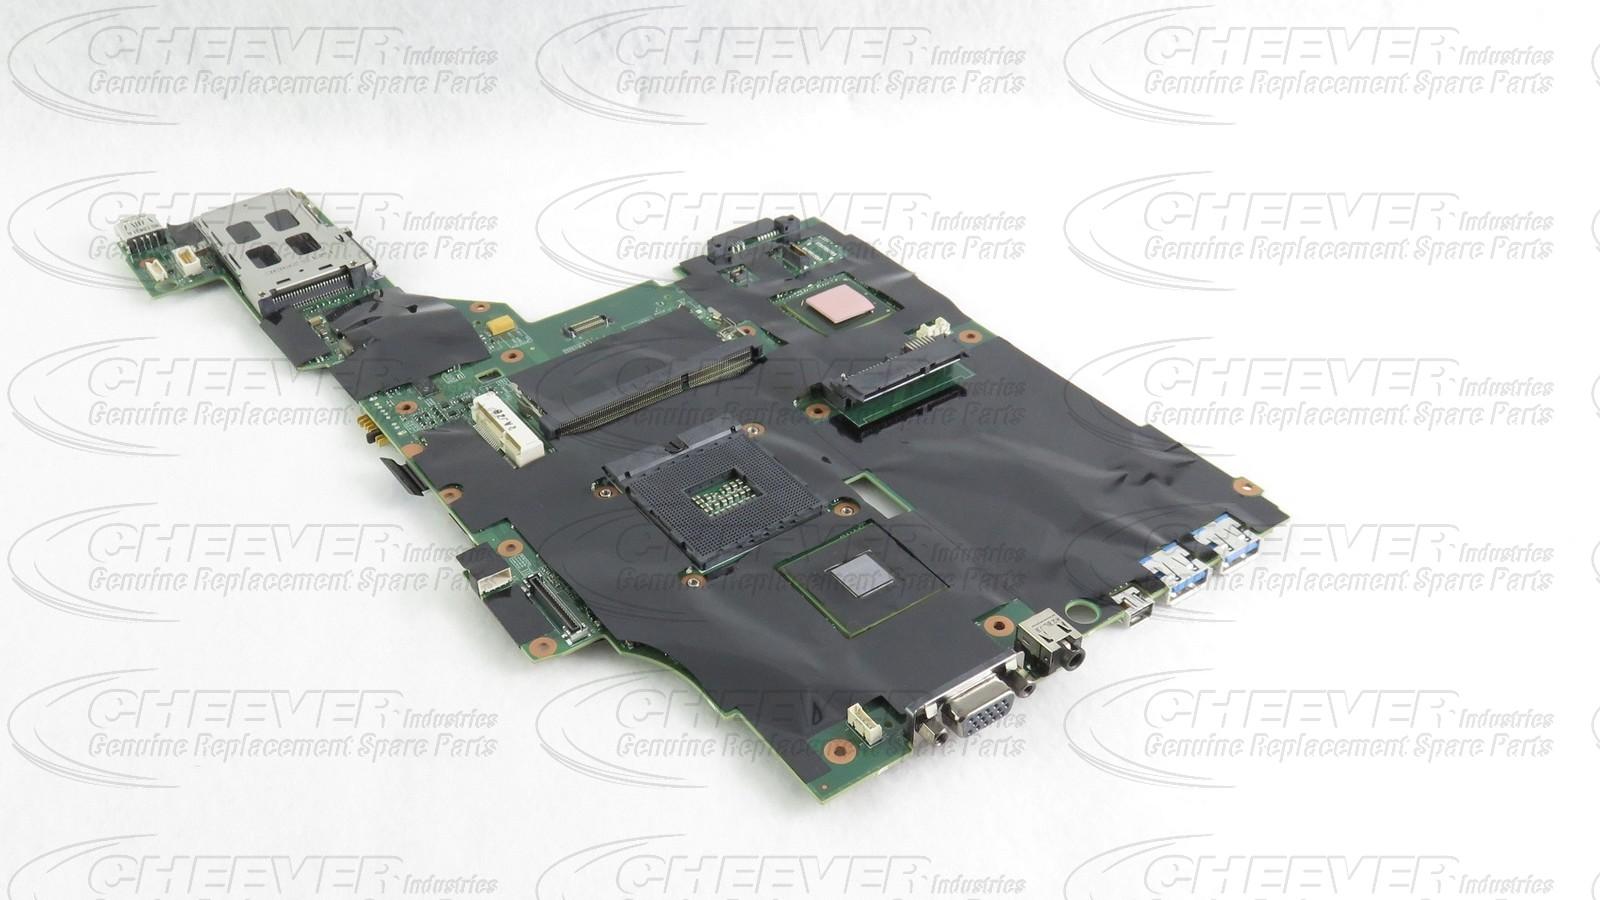 Cheever Industries :: 04W6633 SYSTEM BOARD THINKPAD T430